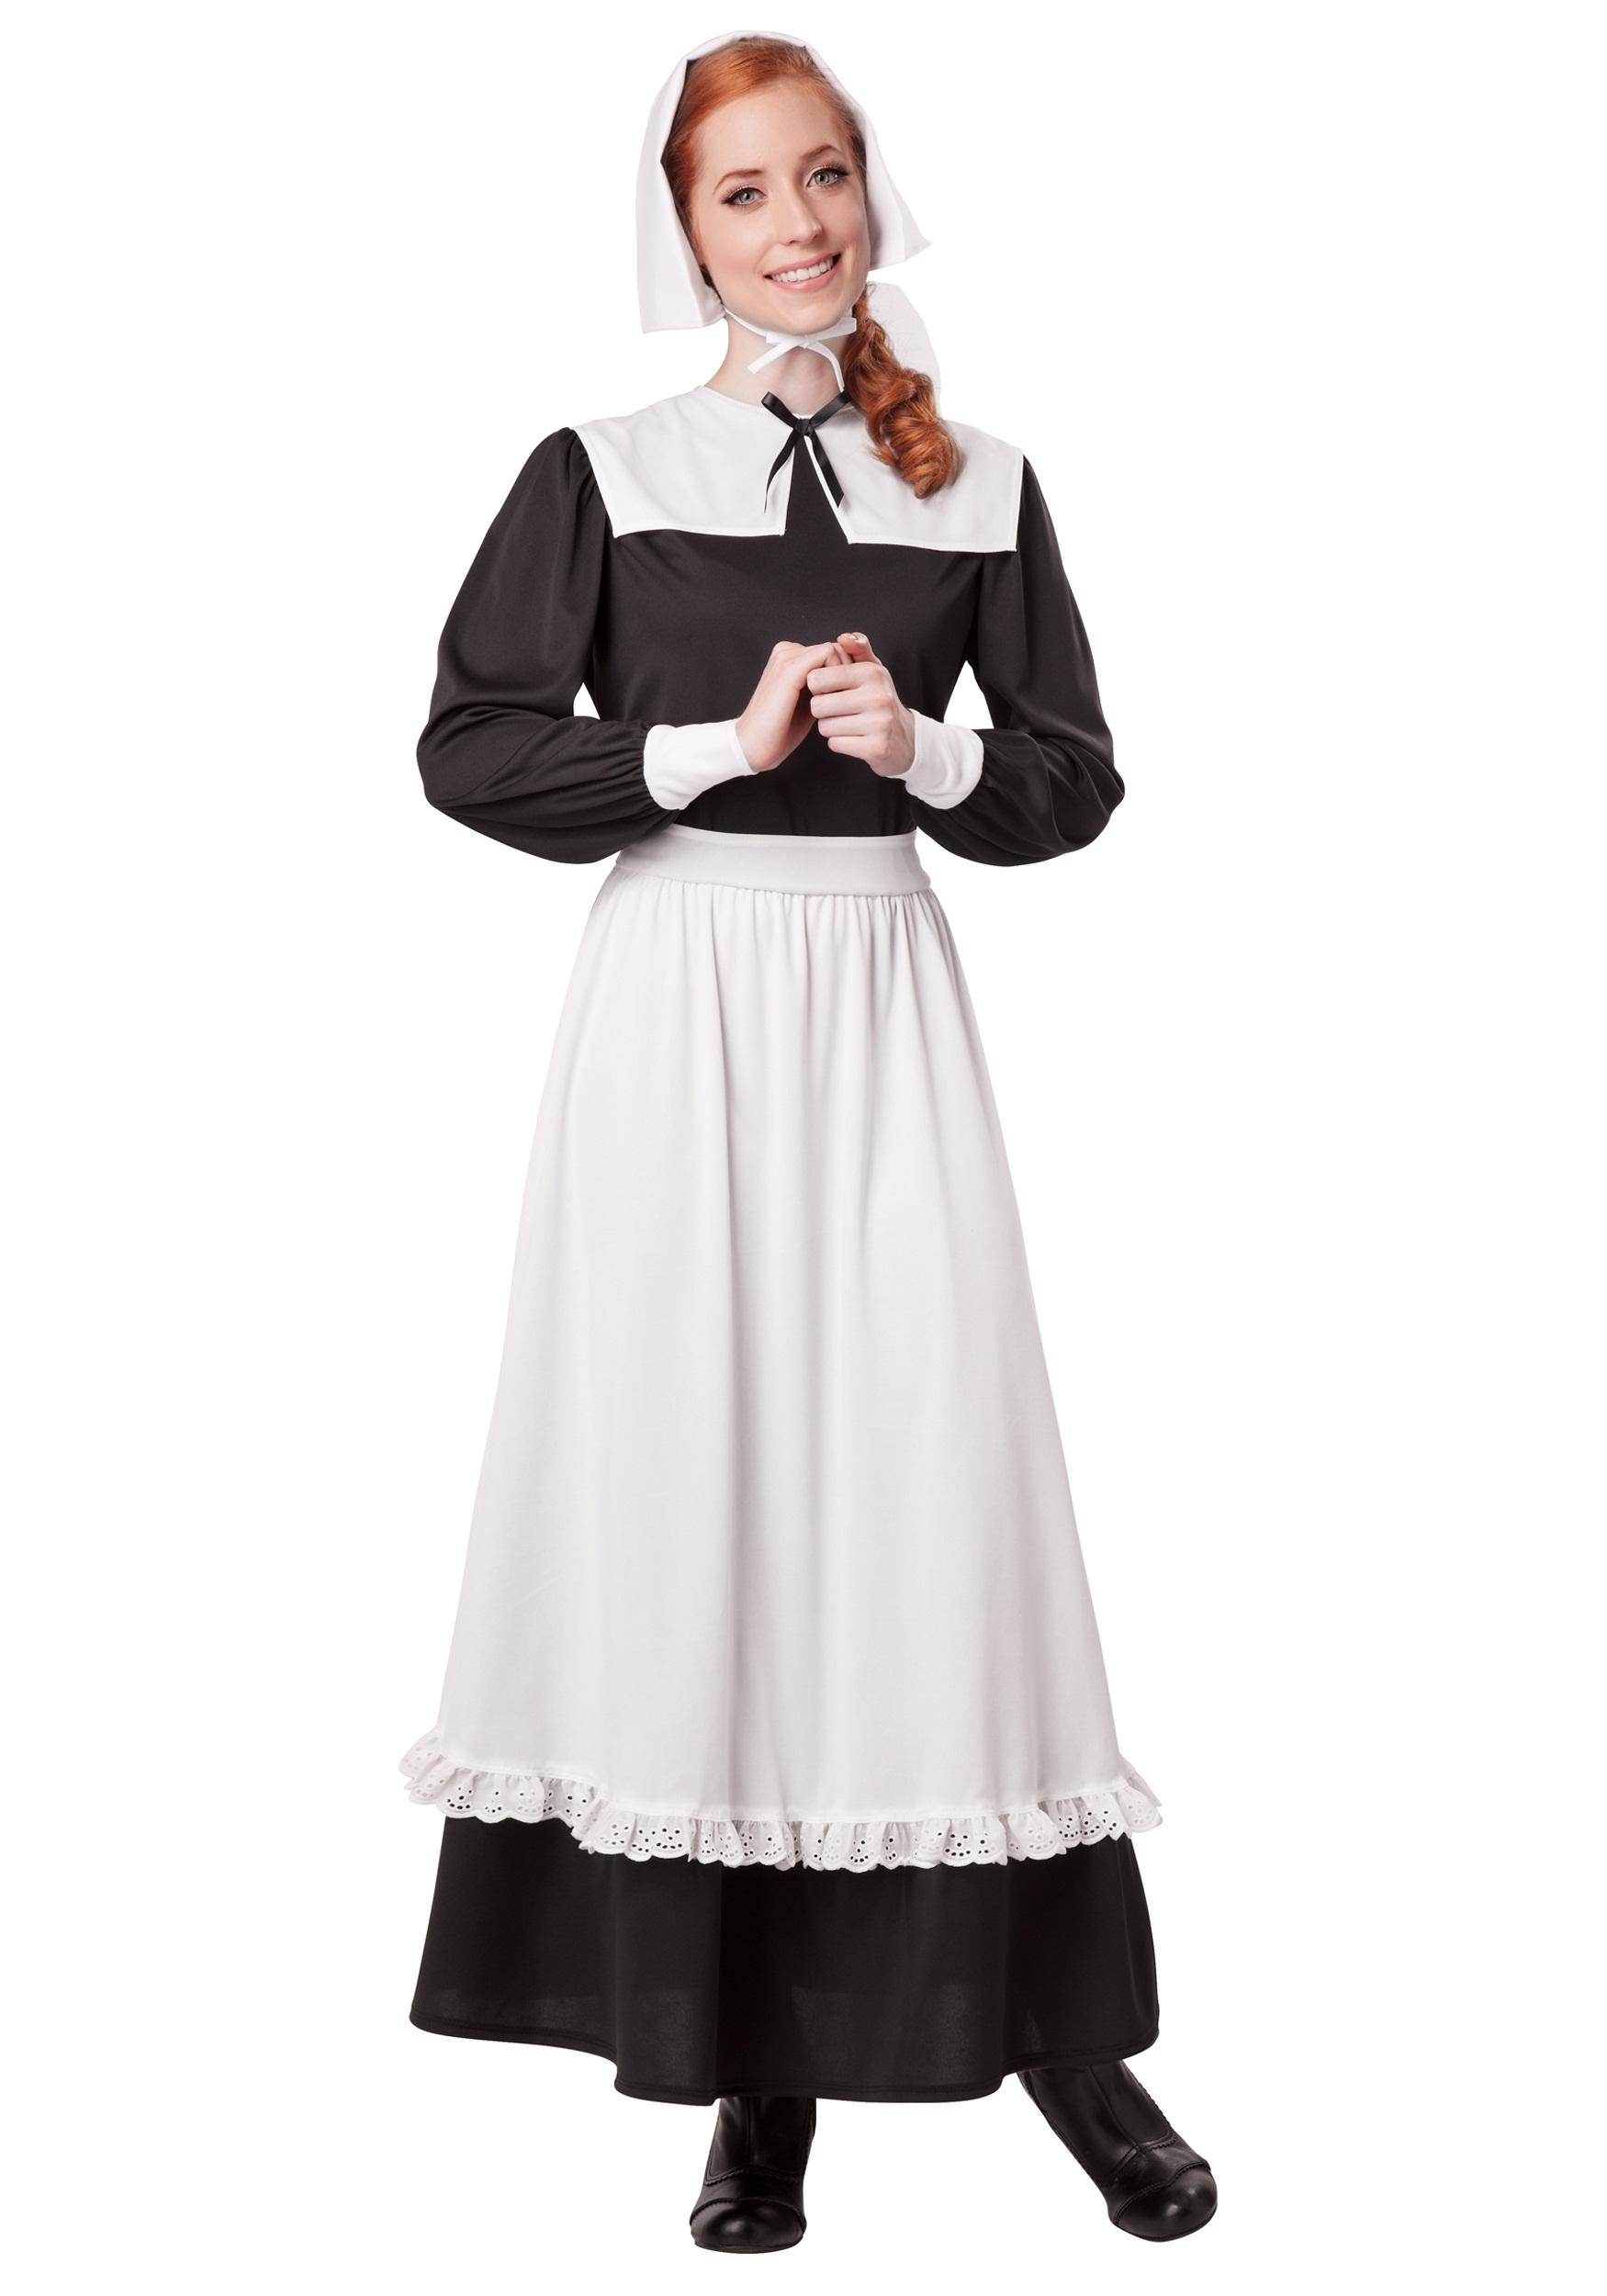 Pilgrim Costume for Women